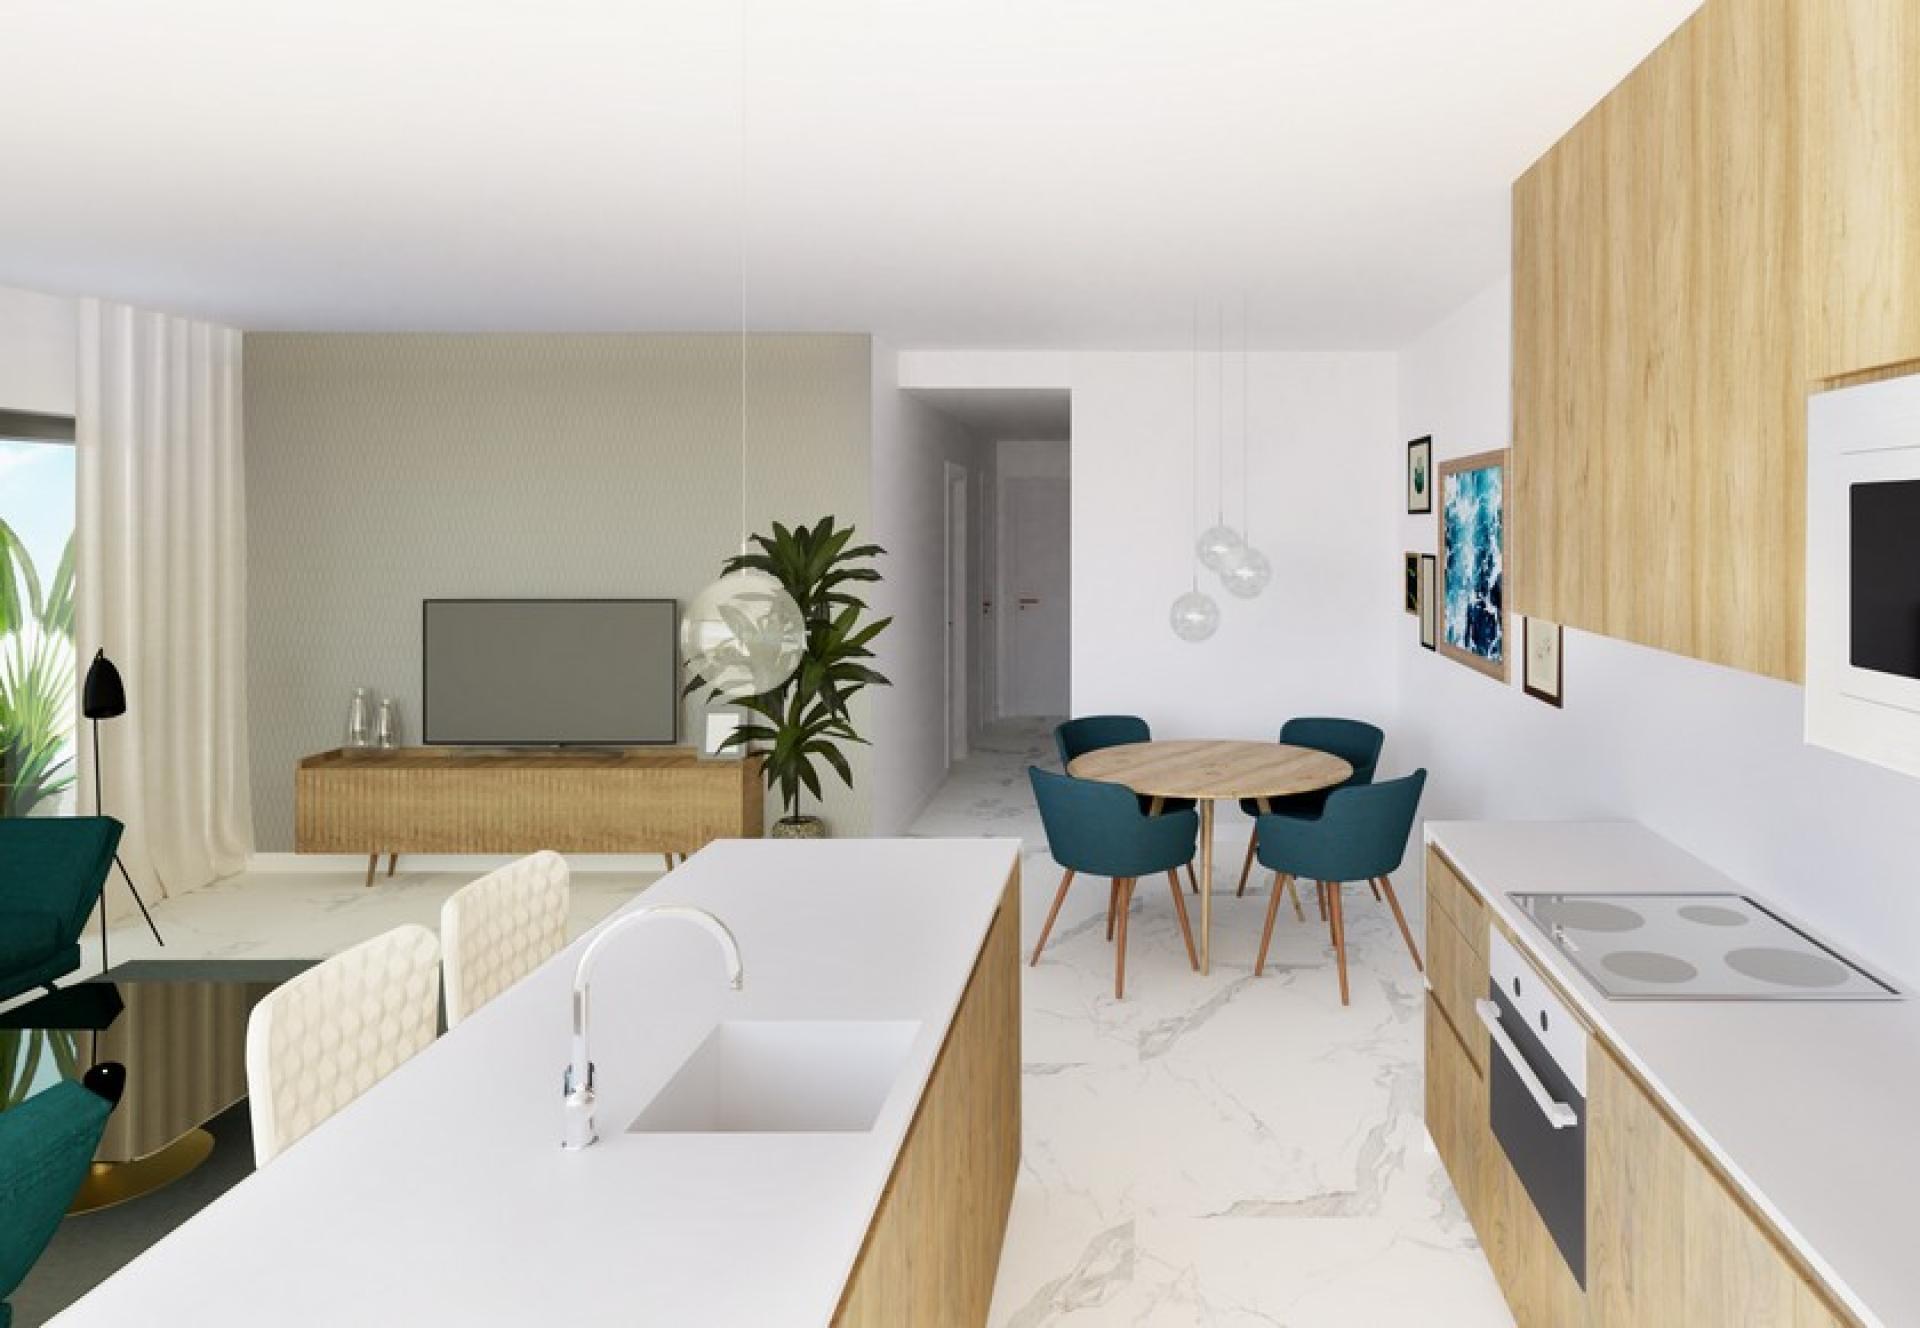 Apartments for sale Guardamar del Segura, Spain in Medvilla Spanje